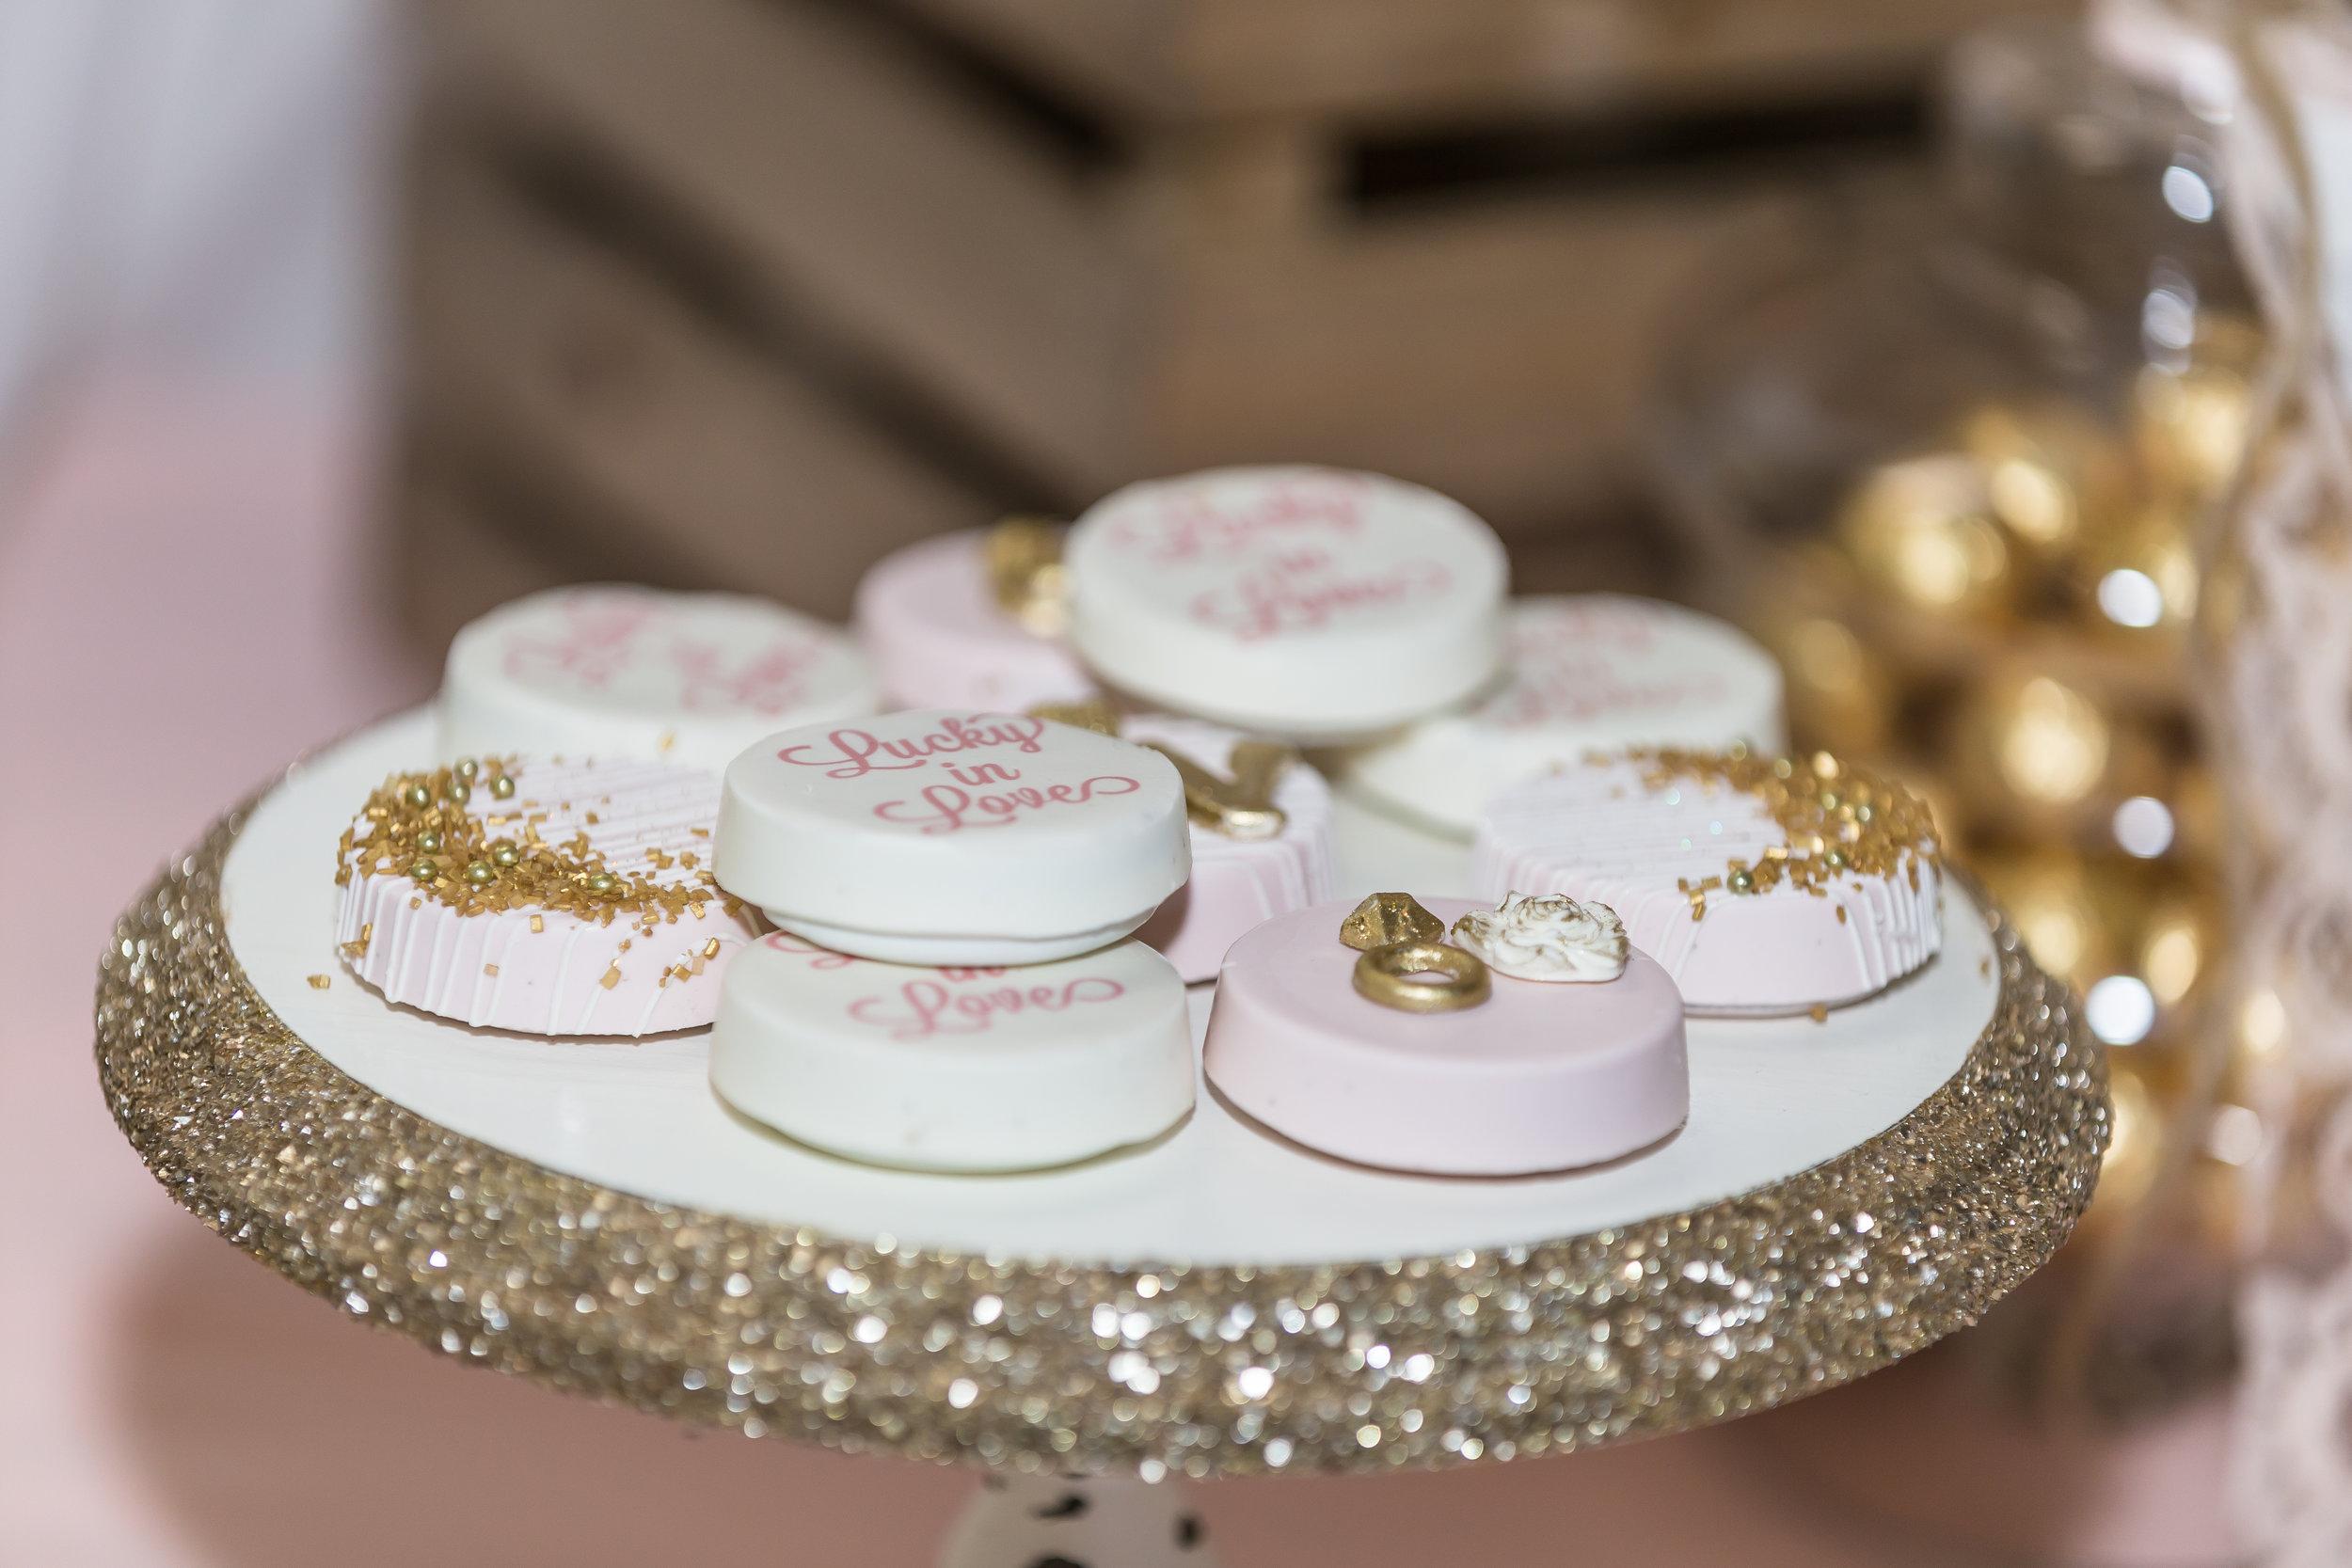 Wedding Desserts-chocolate covered oreos-rustic wedding-wedding dessert ideas-wedding dessert table-www.SugarPartiesLA.com